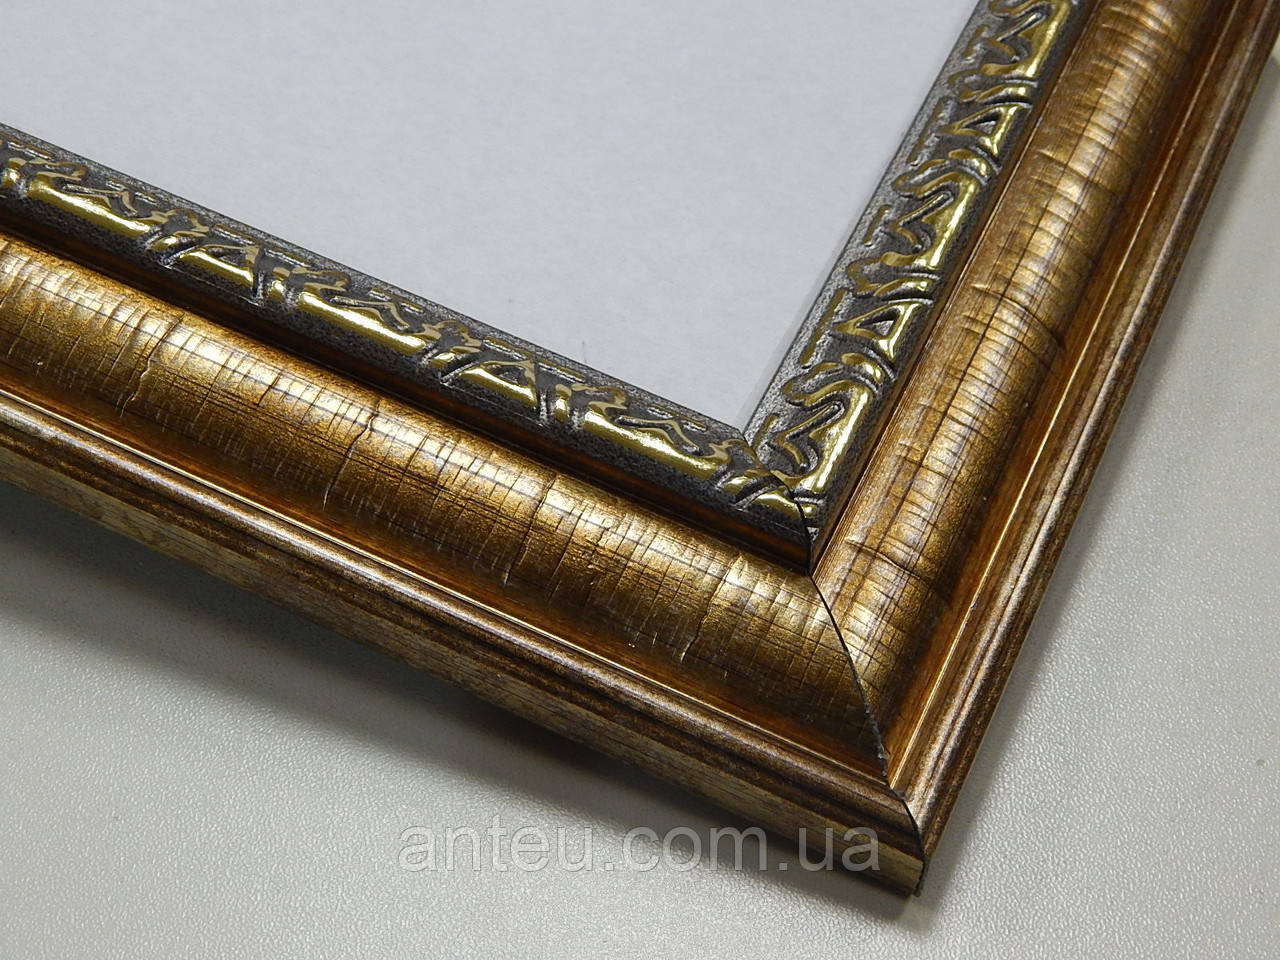 РАМКА А2 (420х594)Антибликовое стеклоРамки для фото,вышивок,картин.